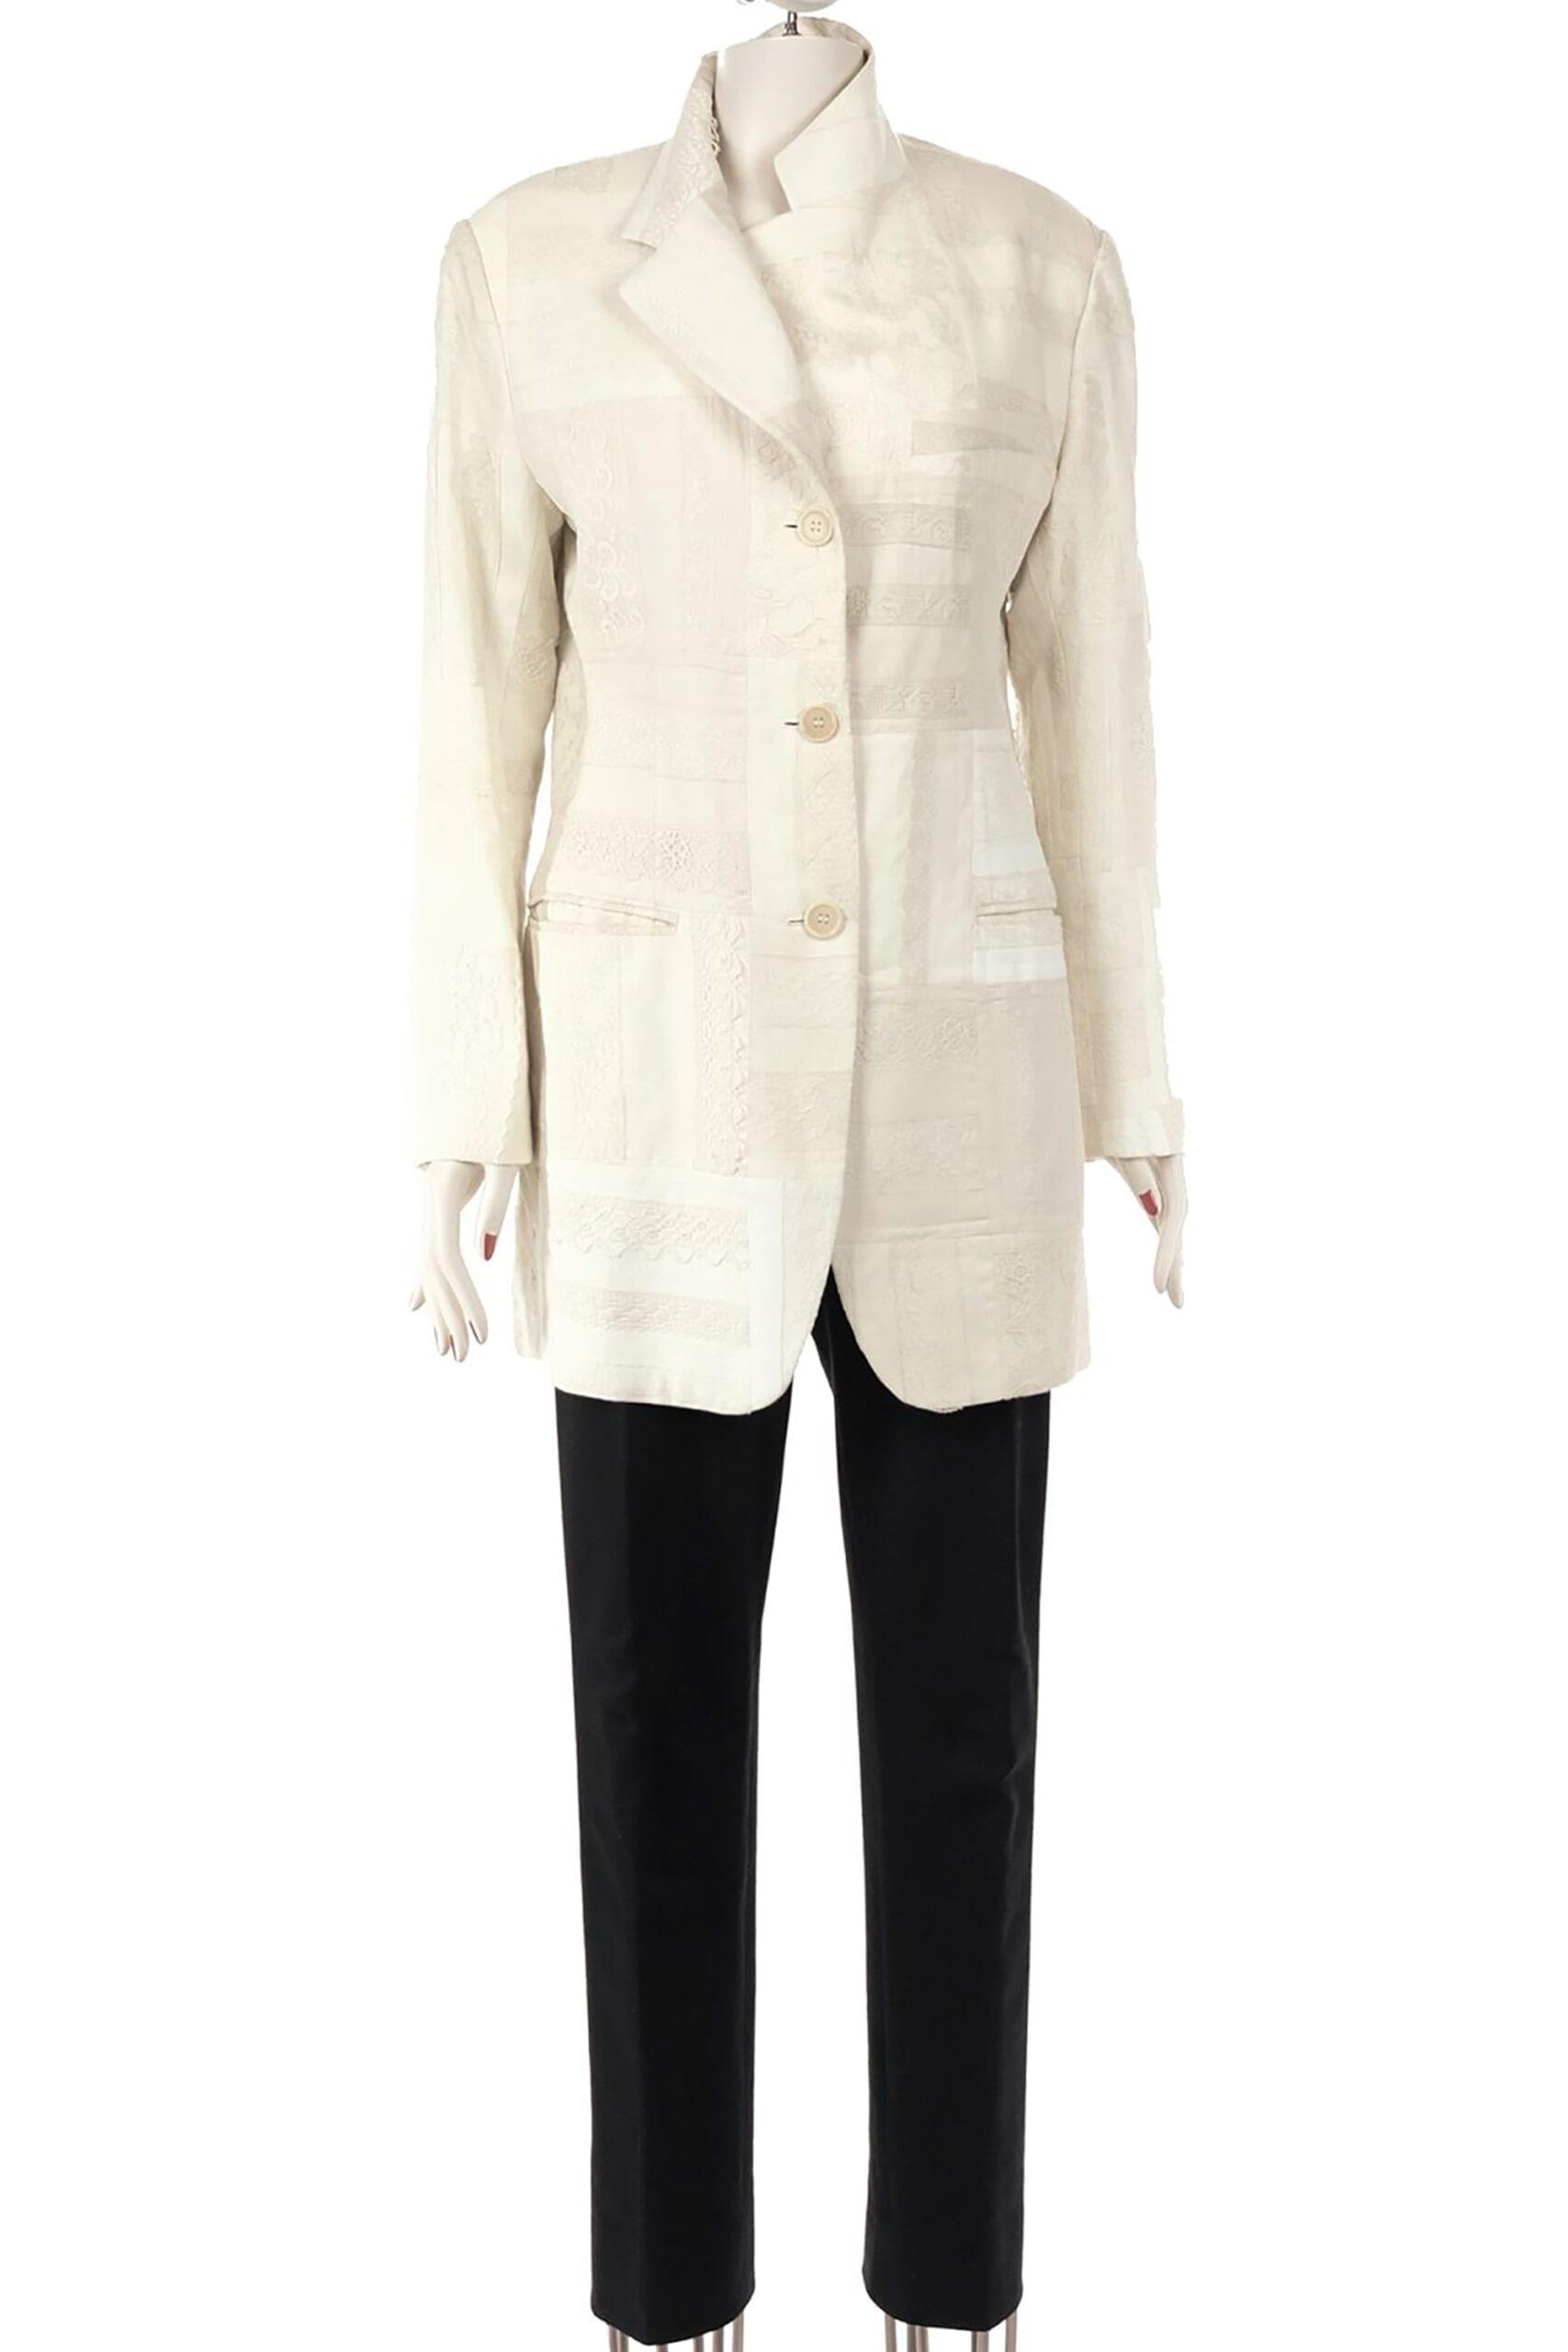 giacca bianca in pizzo dolce e gabbana